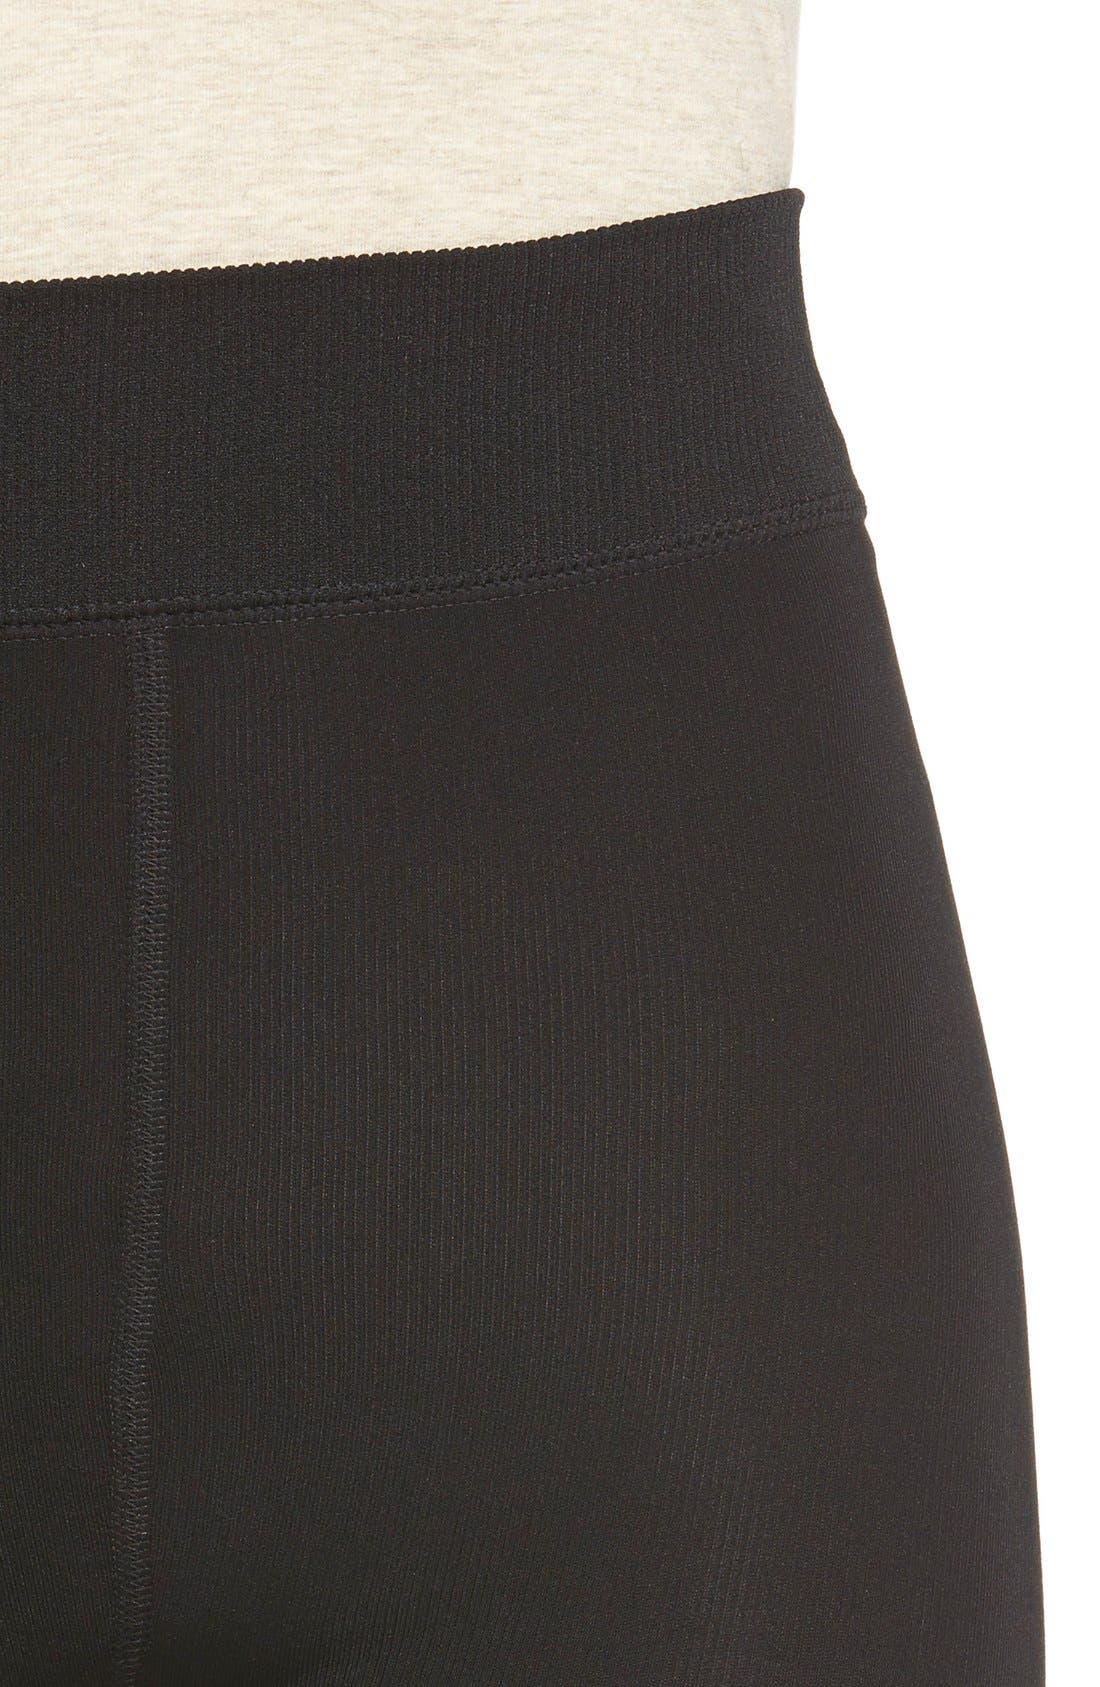 Faux Fur Lined Leggings,                             Alternate thumbnail 4, color,                             001